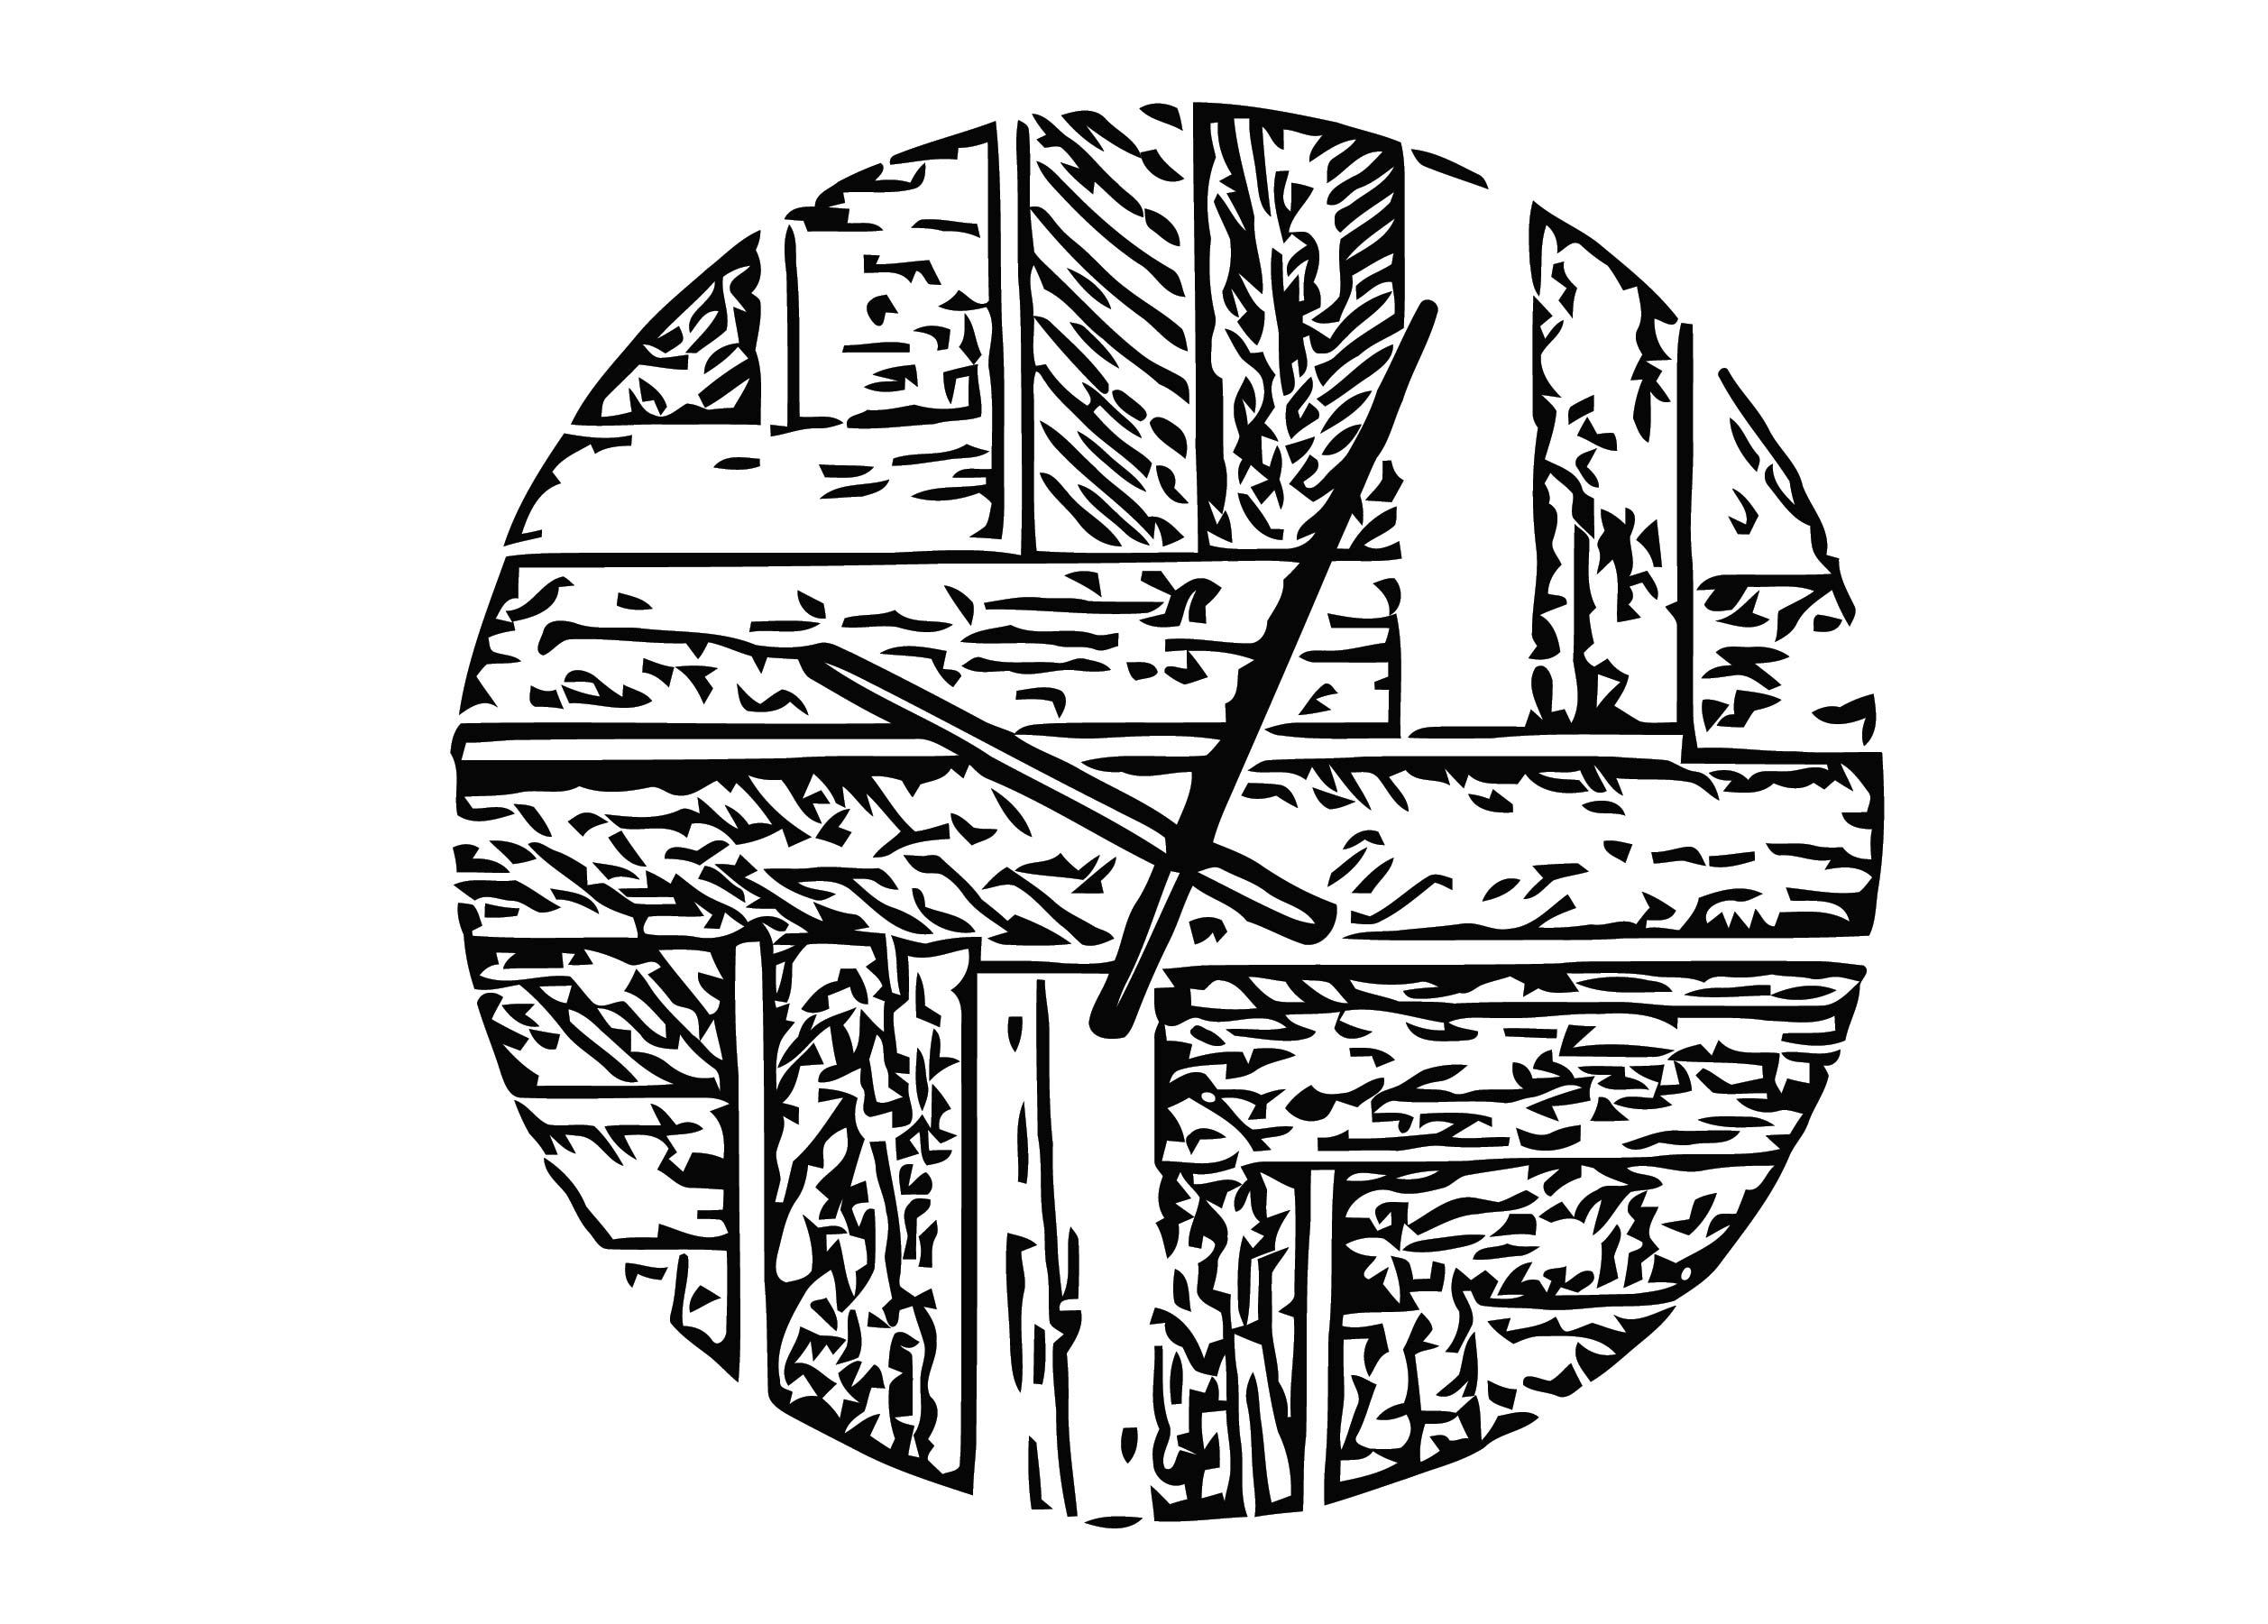 7ac72c69e914dc4bd20d56d42c2cf8 Free Printable Cc Cartoonized Free Printable Coloring Page